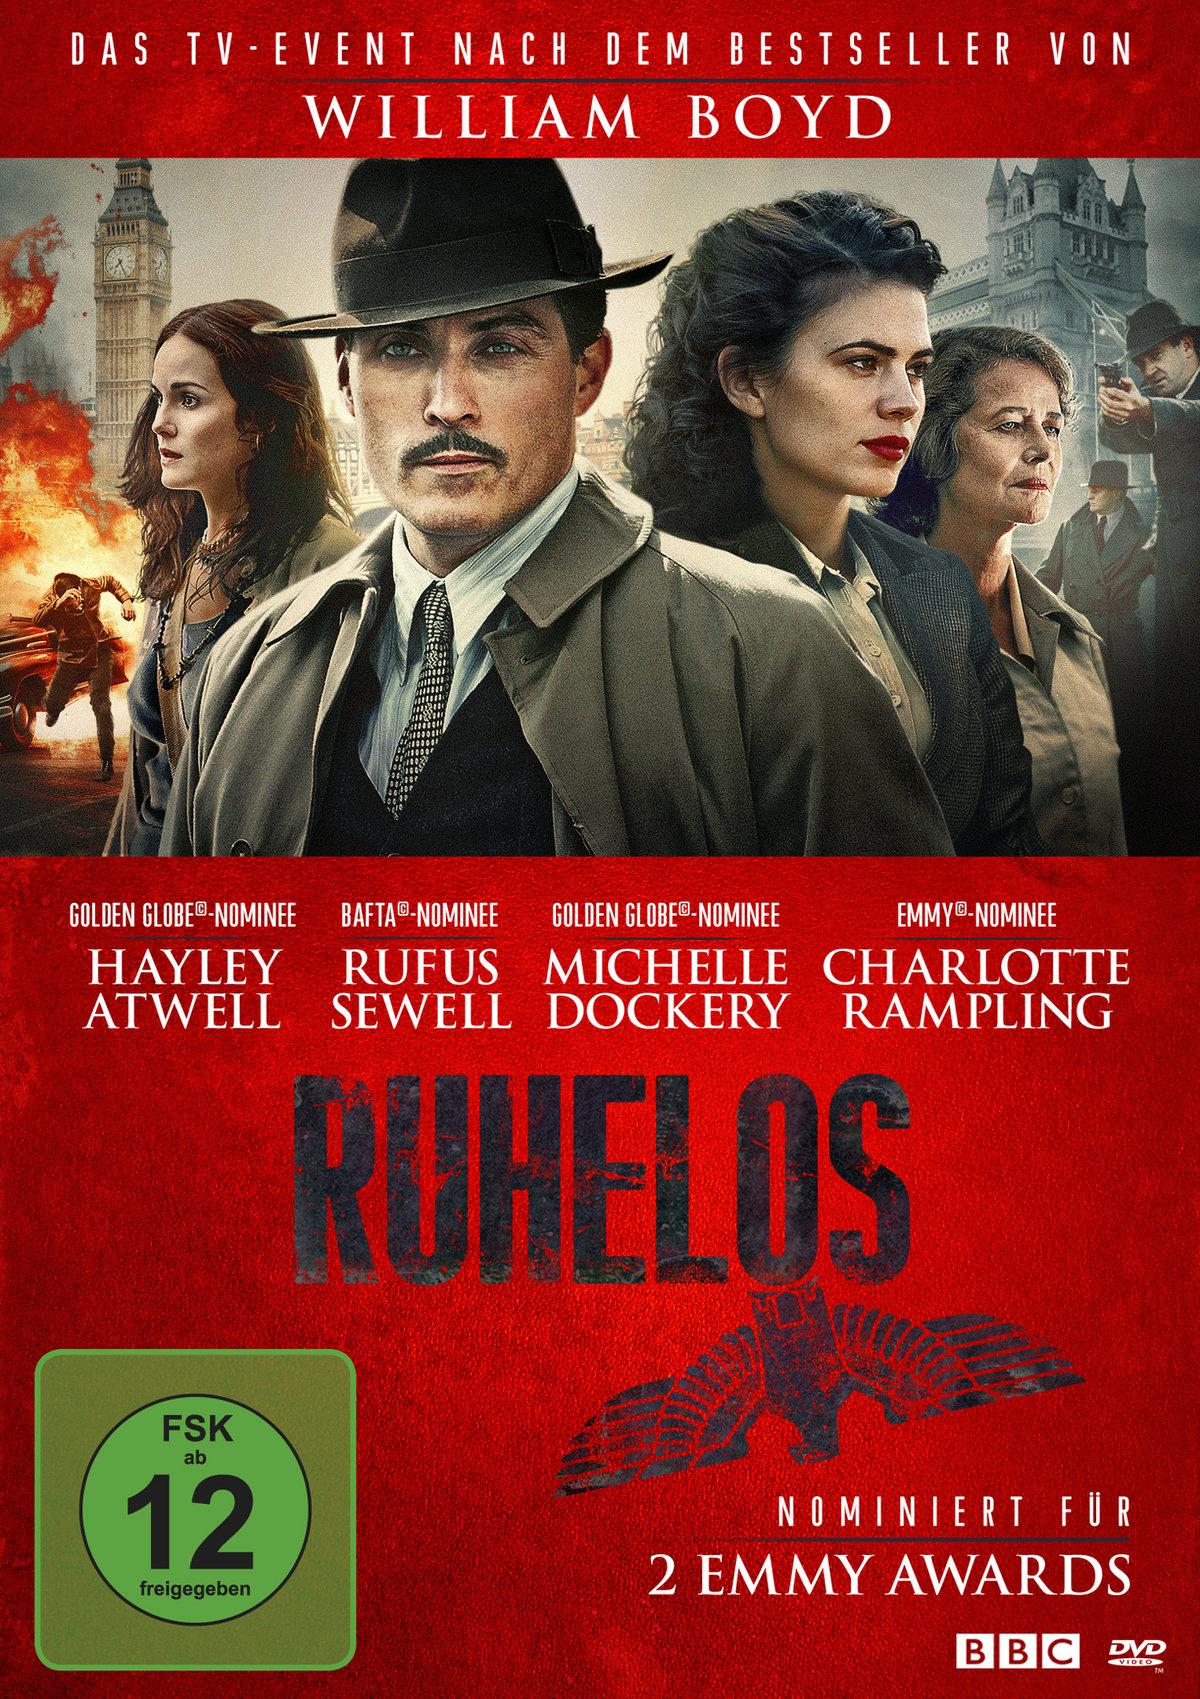 Ruhelos (2012) - Restless